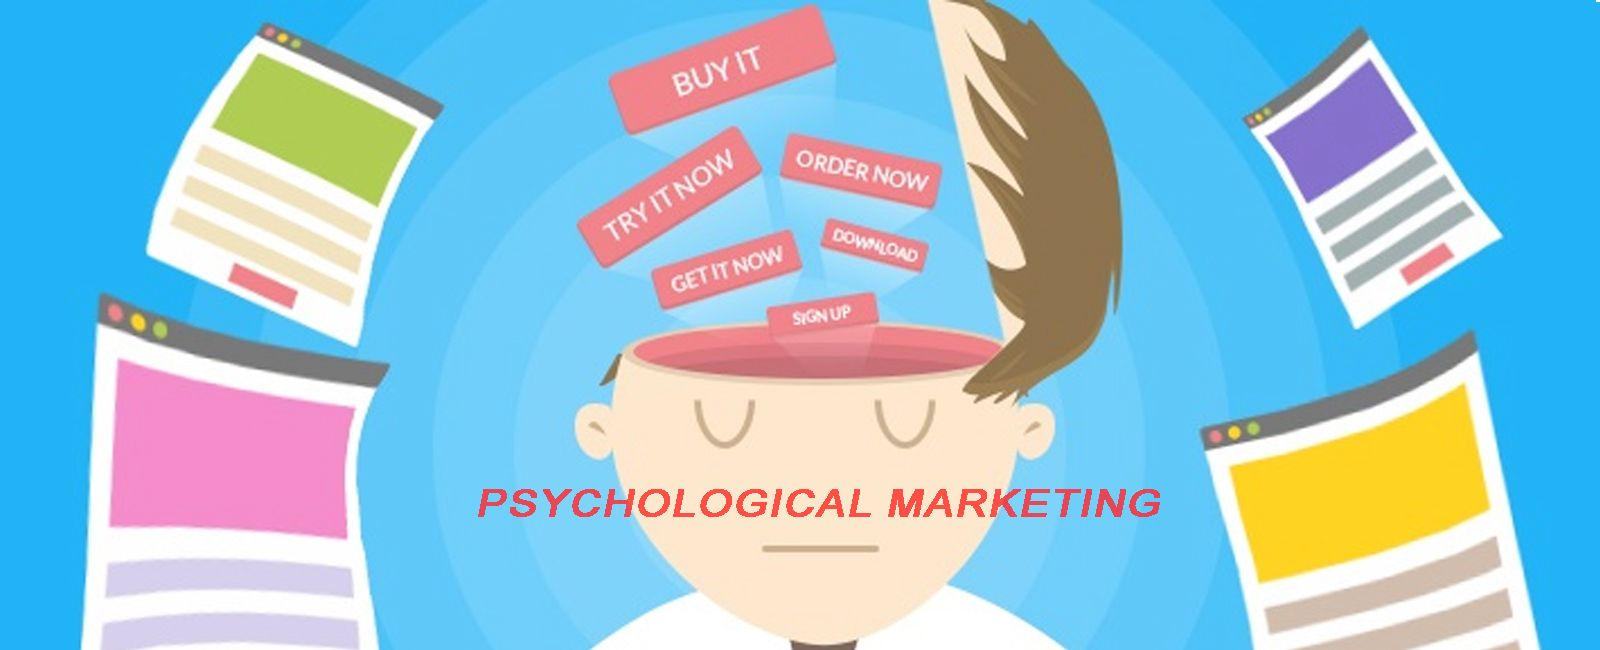 Psychological Marketing